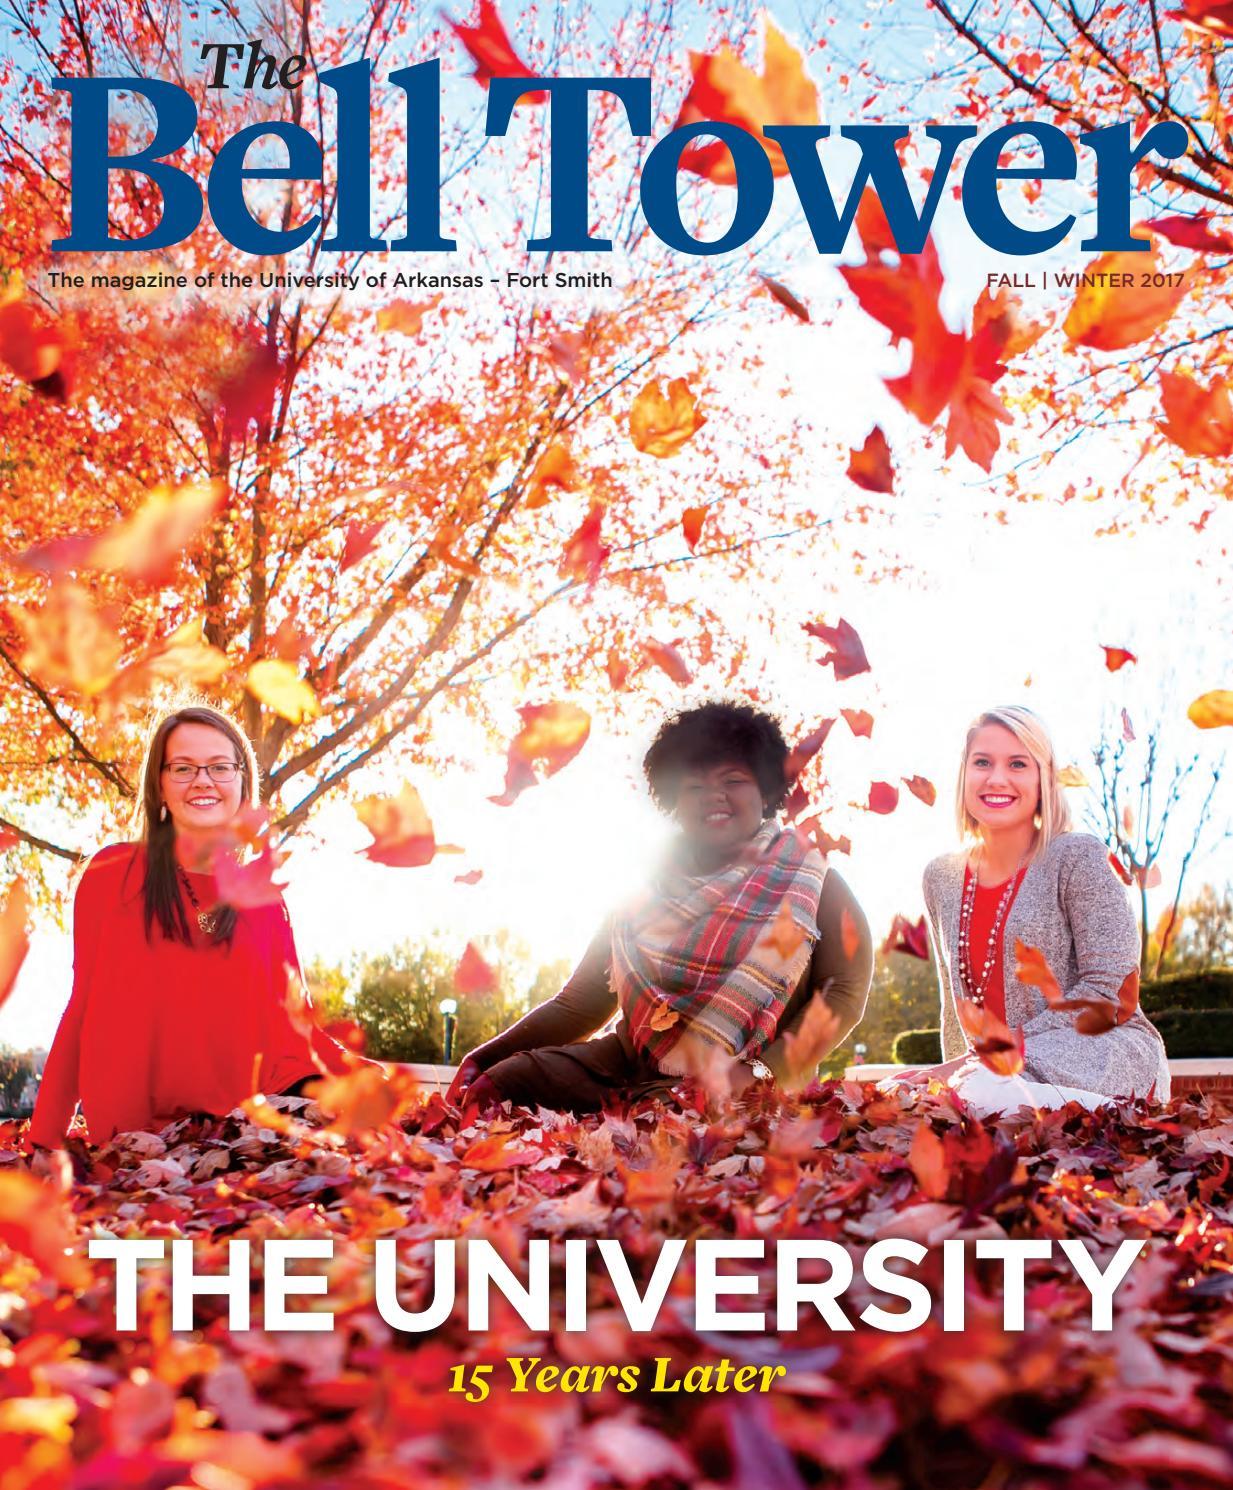 UAFS Bell Tower Alumni Magazine Fall / Winter 2017 by